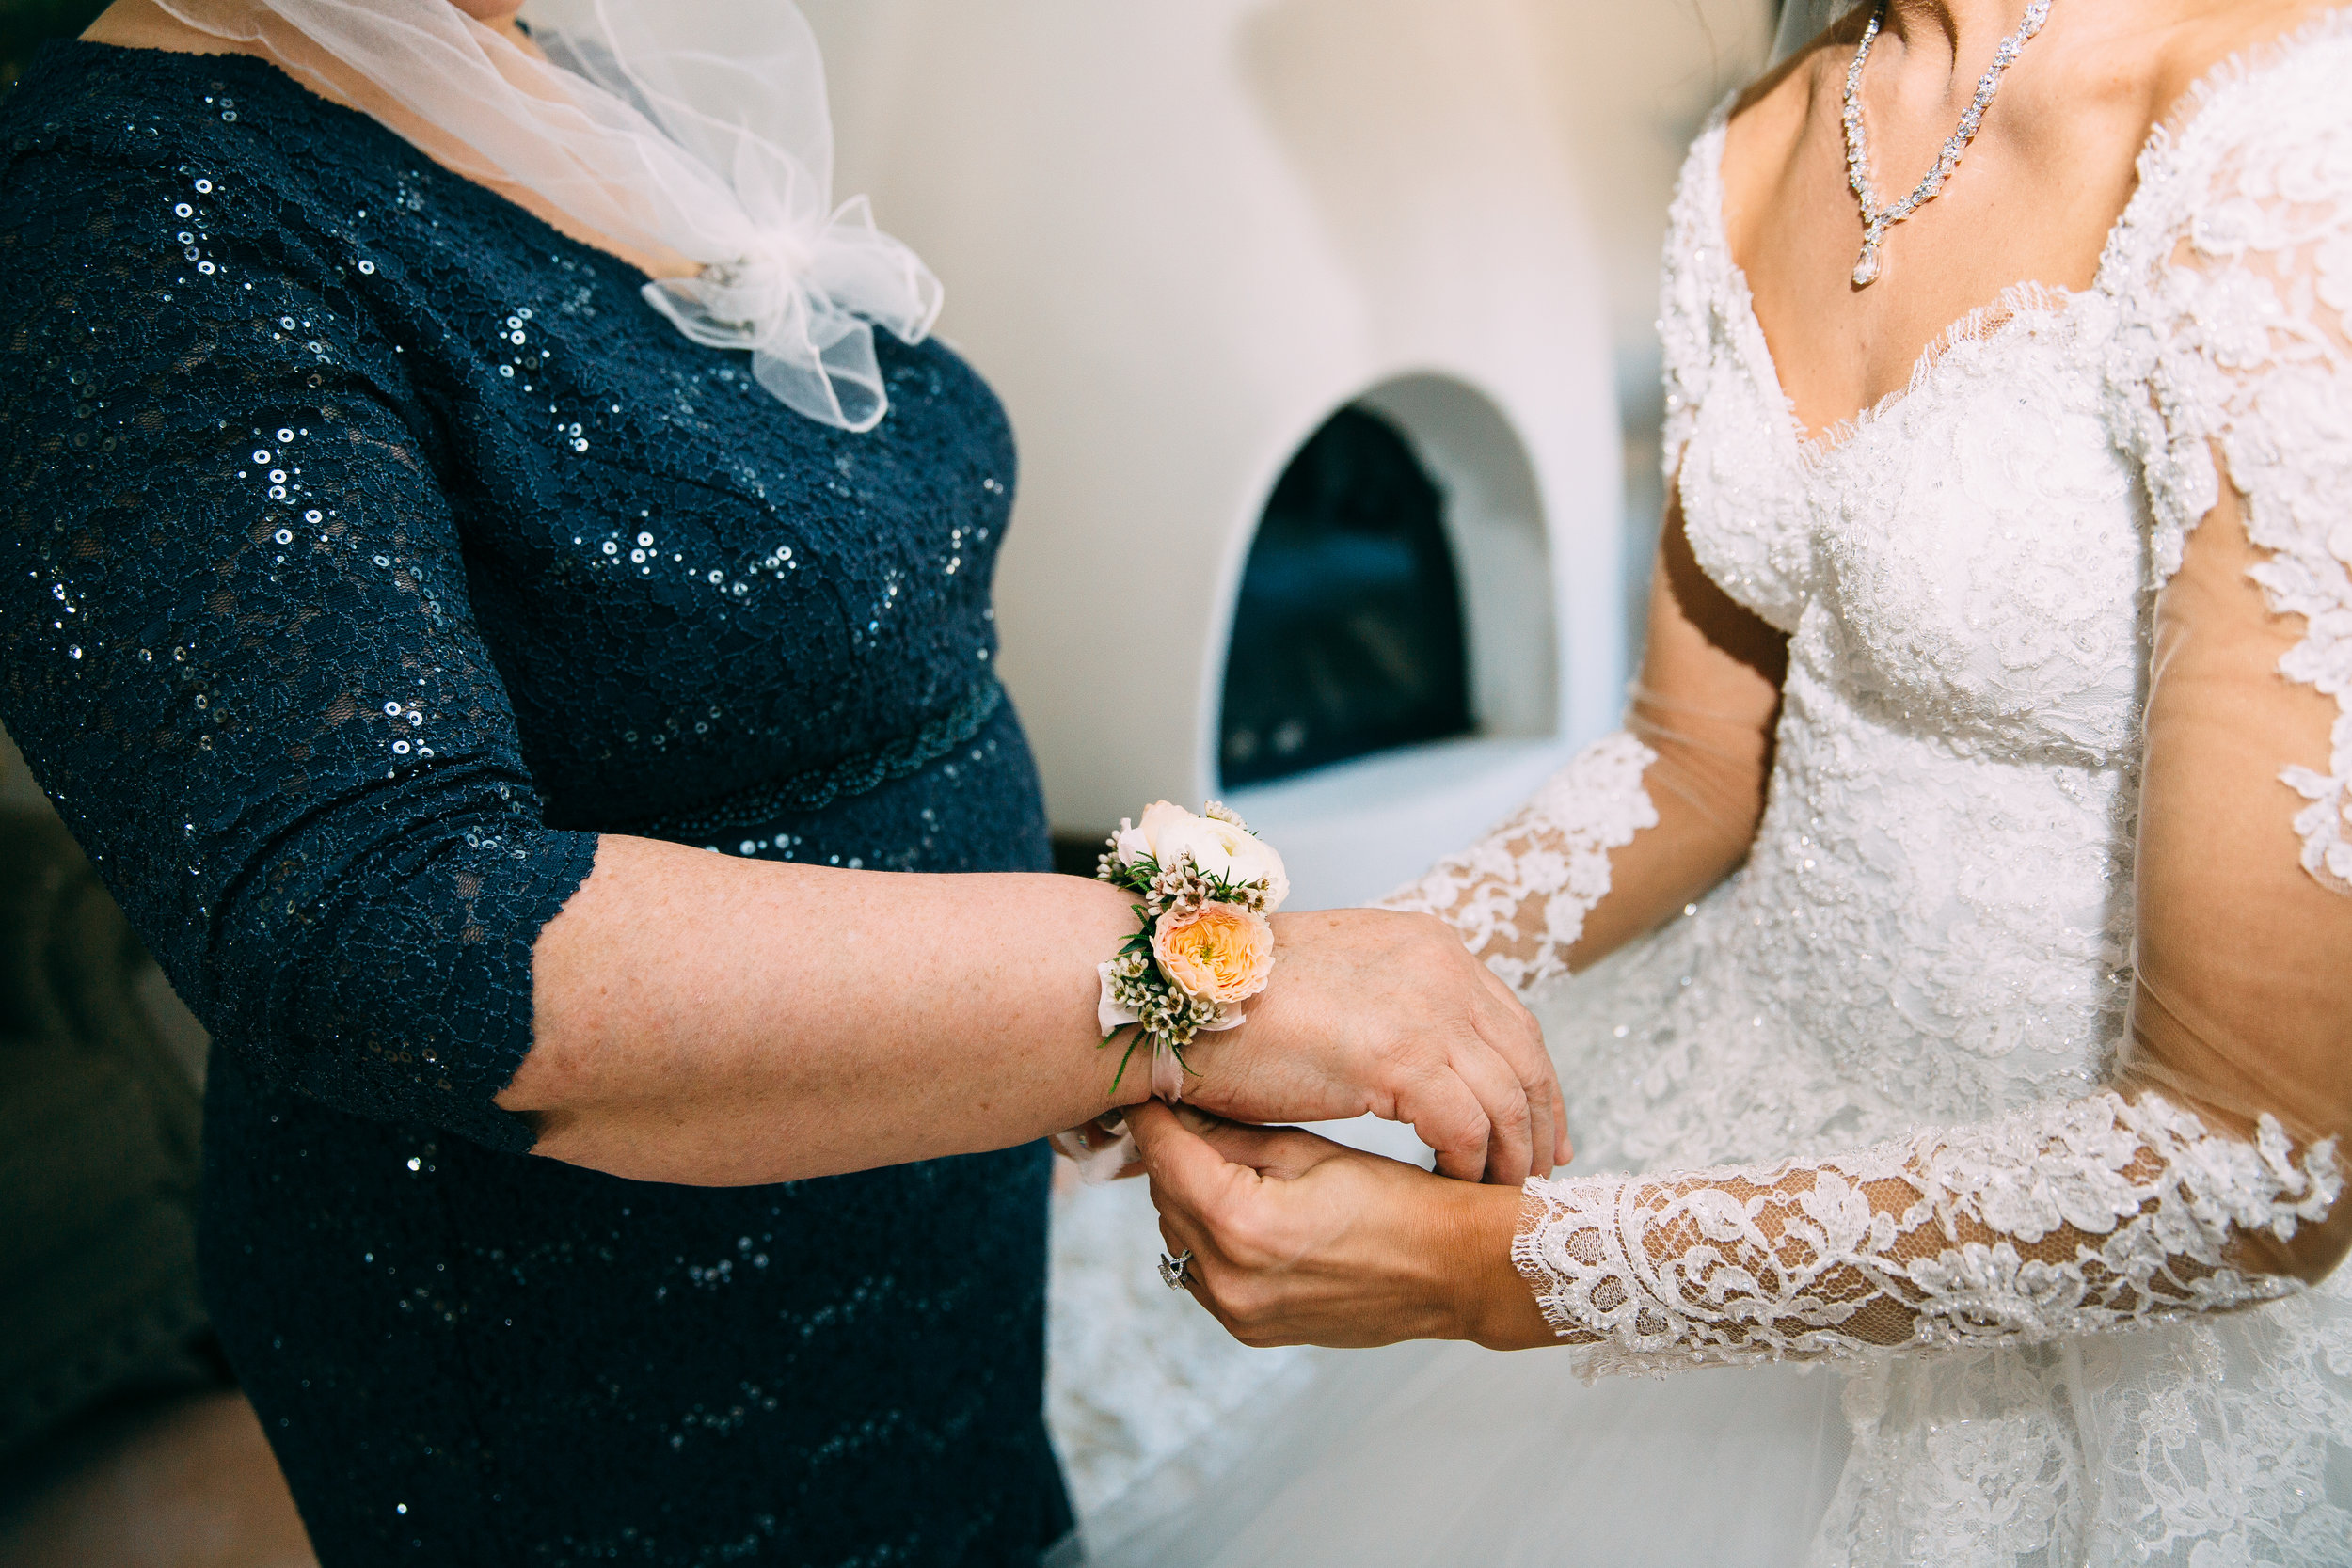 Violette-fleurs-anna-perevertaylo-White-Blush-elegant-flowers-for-wedding-decor-upscale-design-roseville-sacramento-california-rancho-robles-vinyards-lincoln-elegant-luxury-bride-mother-corsage.jpg